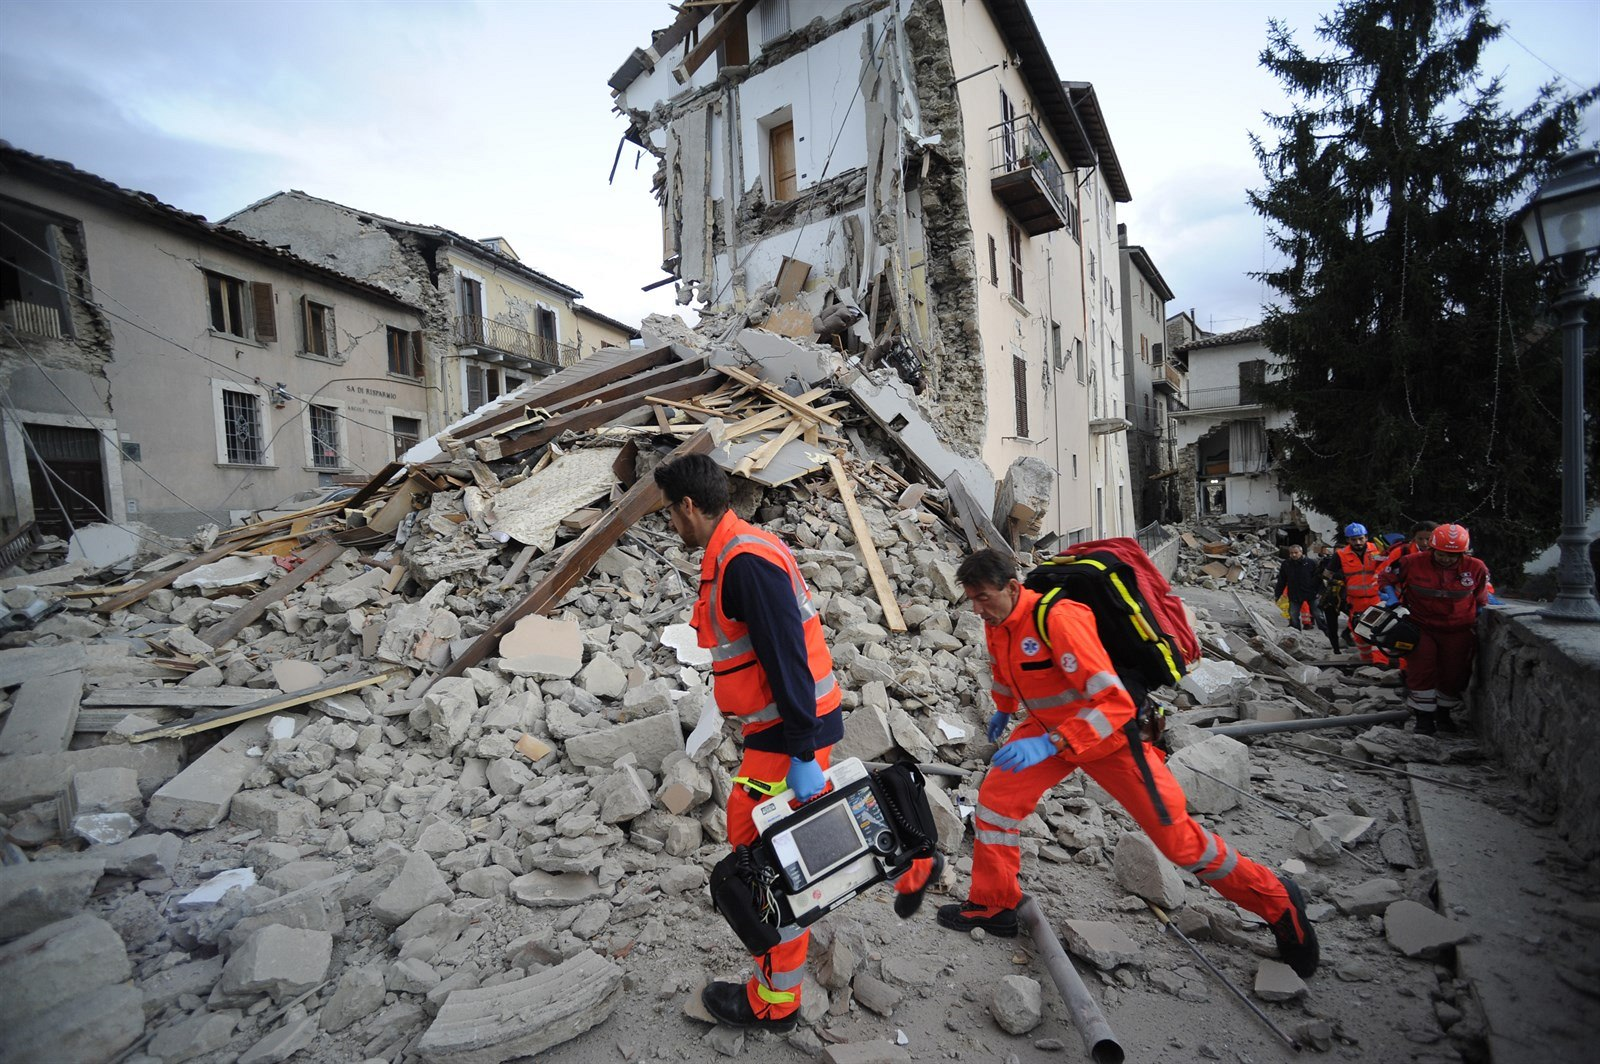 Nuovo sisma di 3.4 tra Arquata,Accumoli